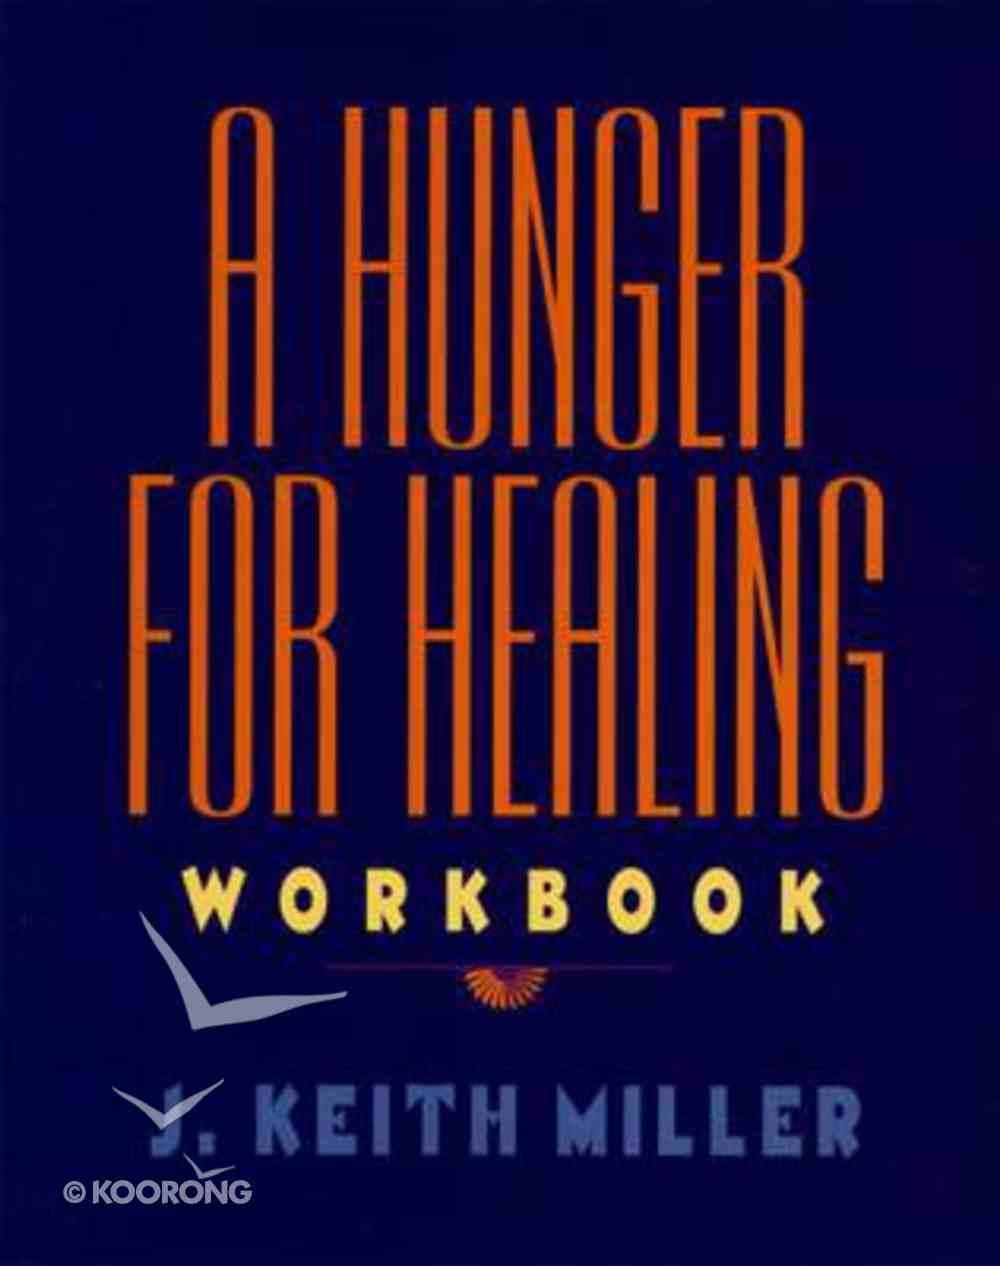 A Hunger For Healing (Workbook) Paperback